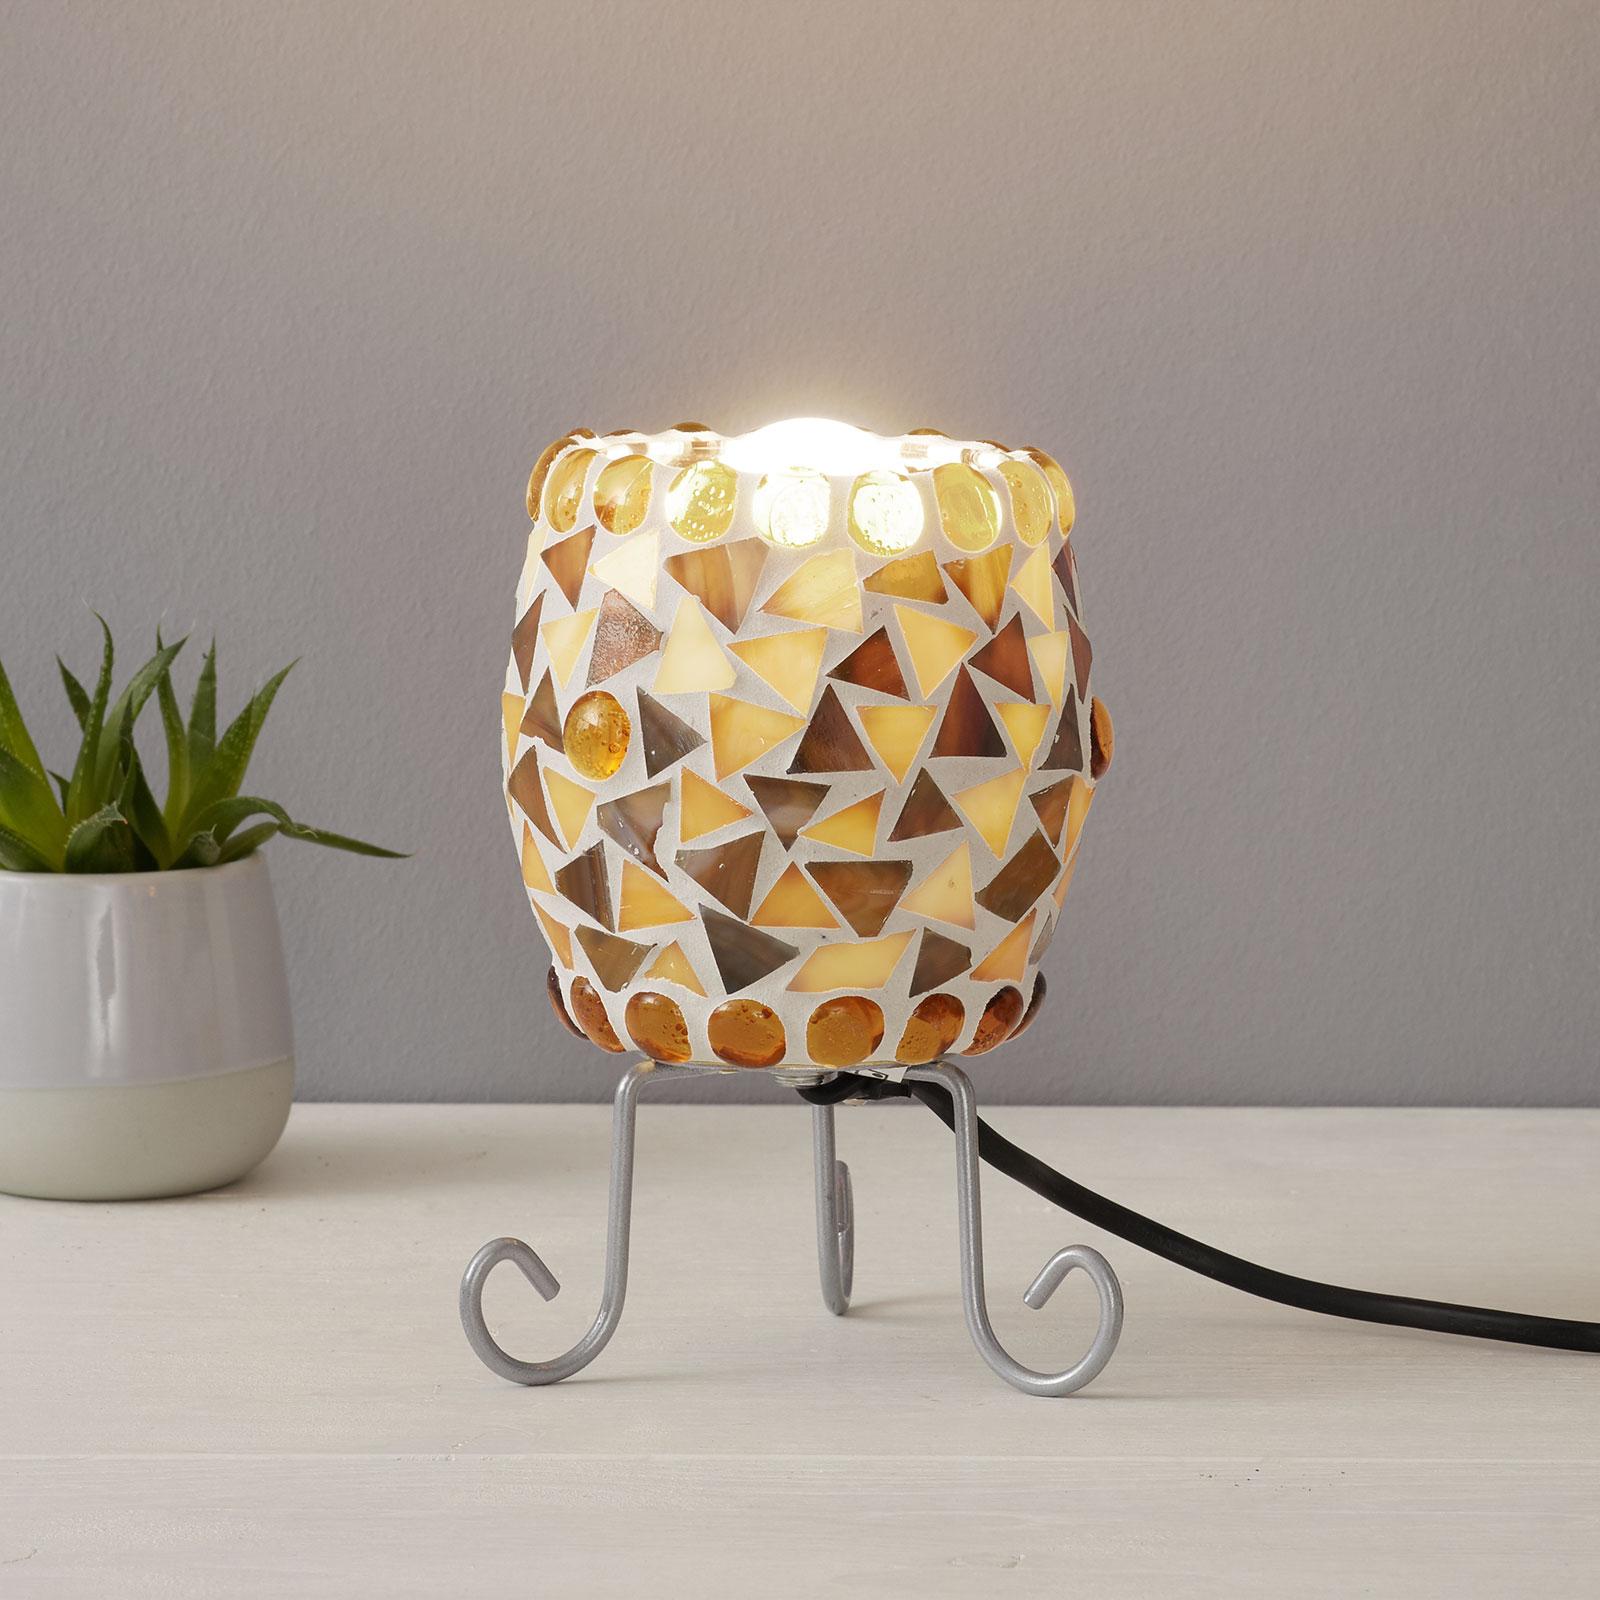 Tafellamp Enya m. glasmozaïek crème-bruin